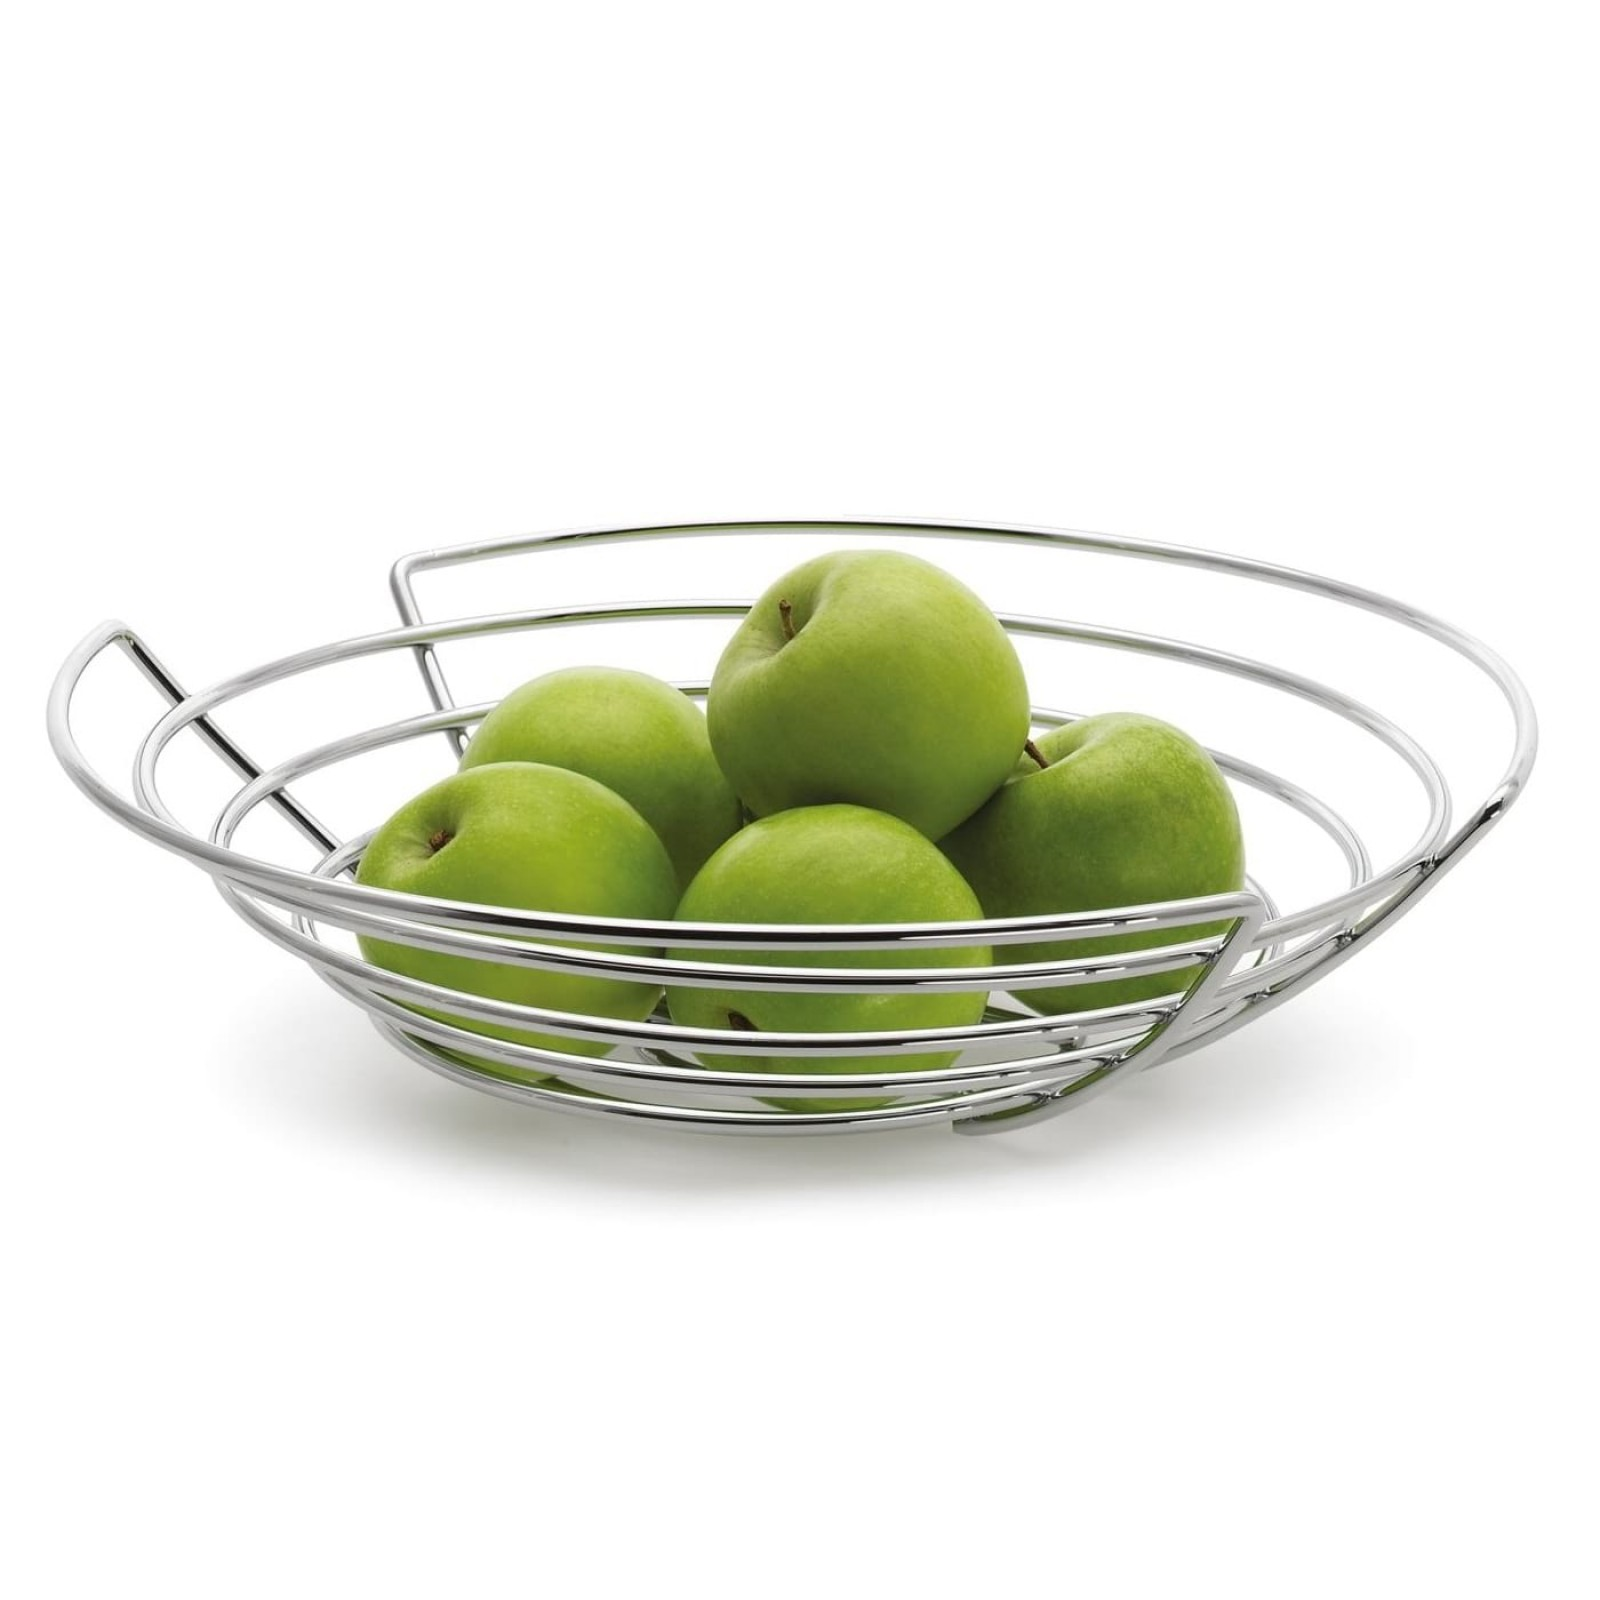 Wires Basket / Fruit Bowl L (Large) - Blomus